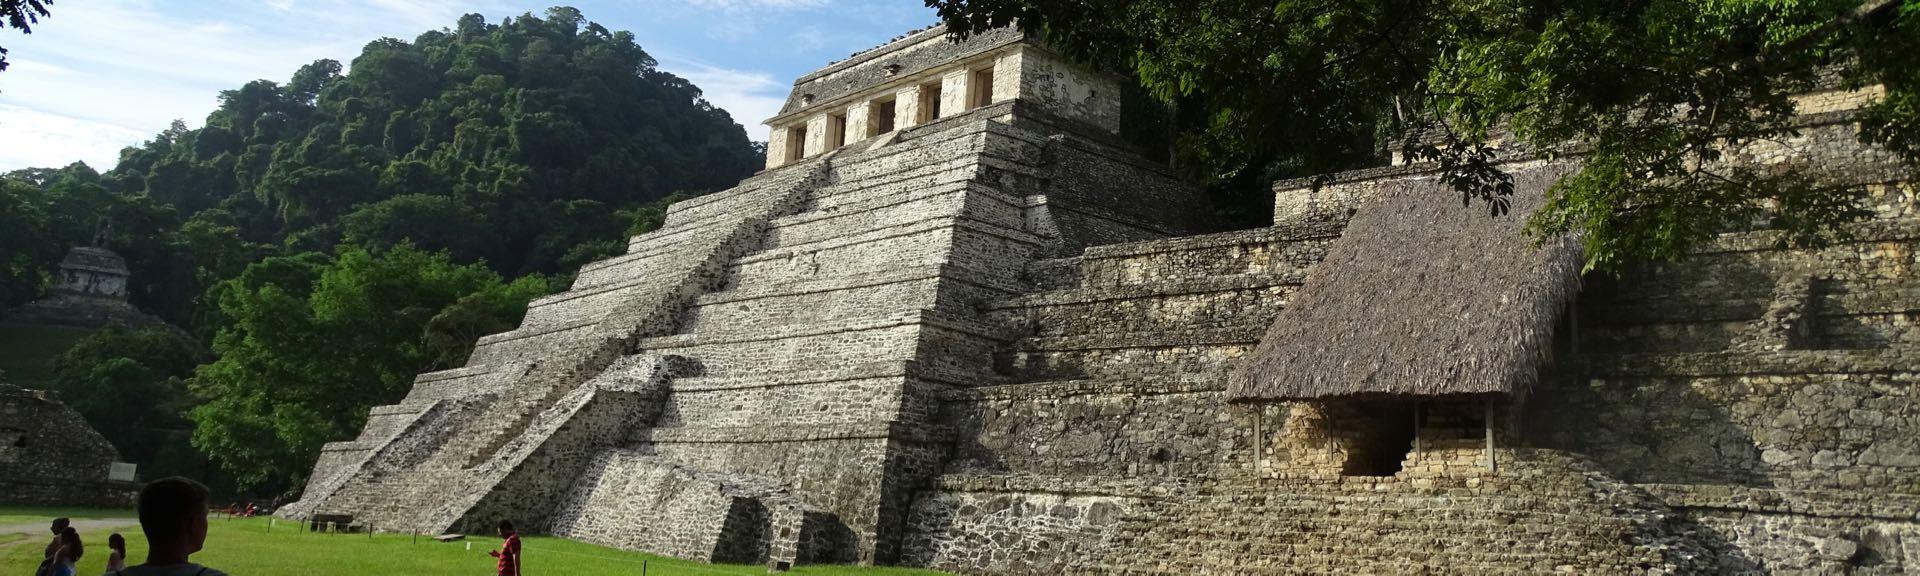 Banner Palenque Mexico City Rondreis Op Maat Specialist